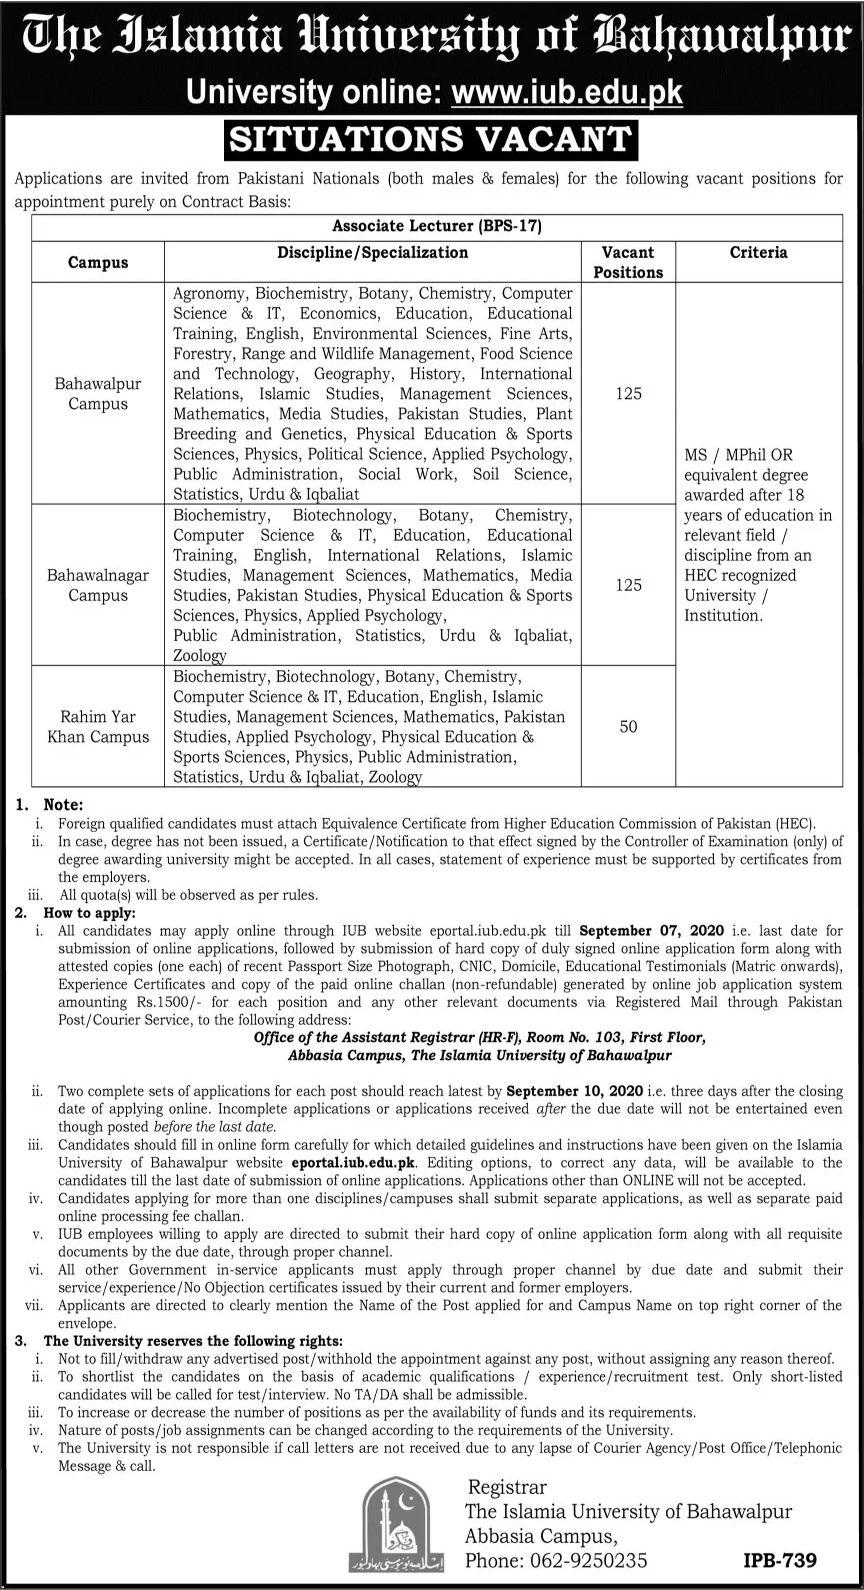 The Islamia University of Bahawalpur Jobs August 2020 (300 Posts)